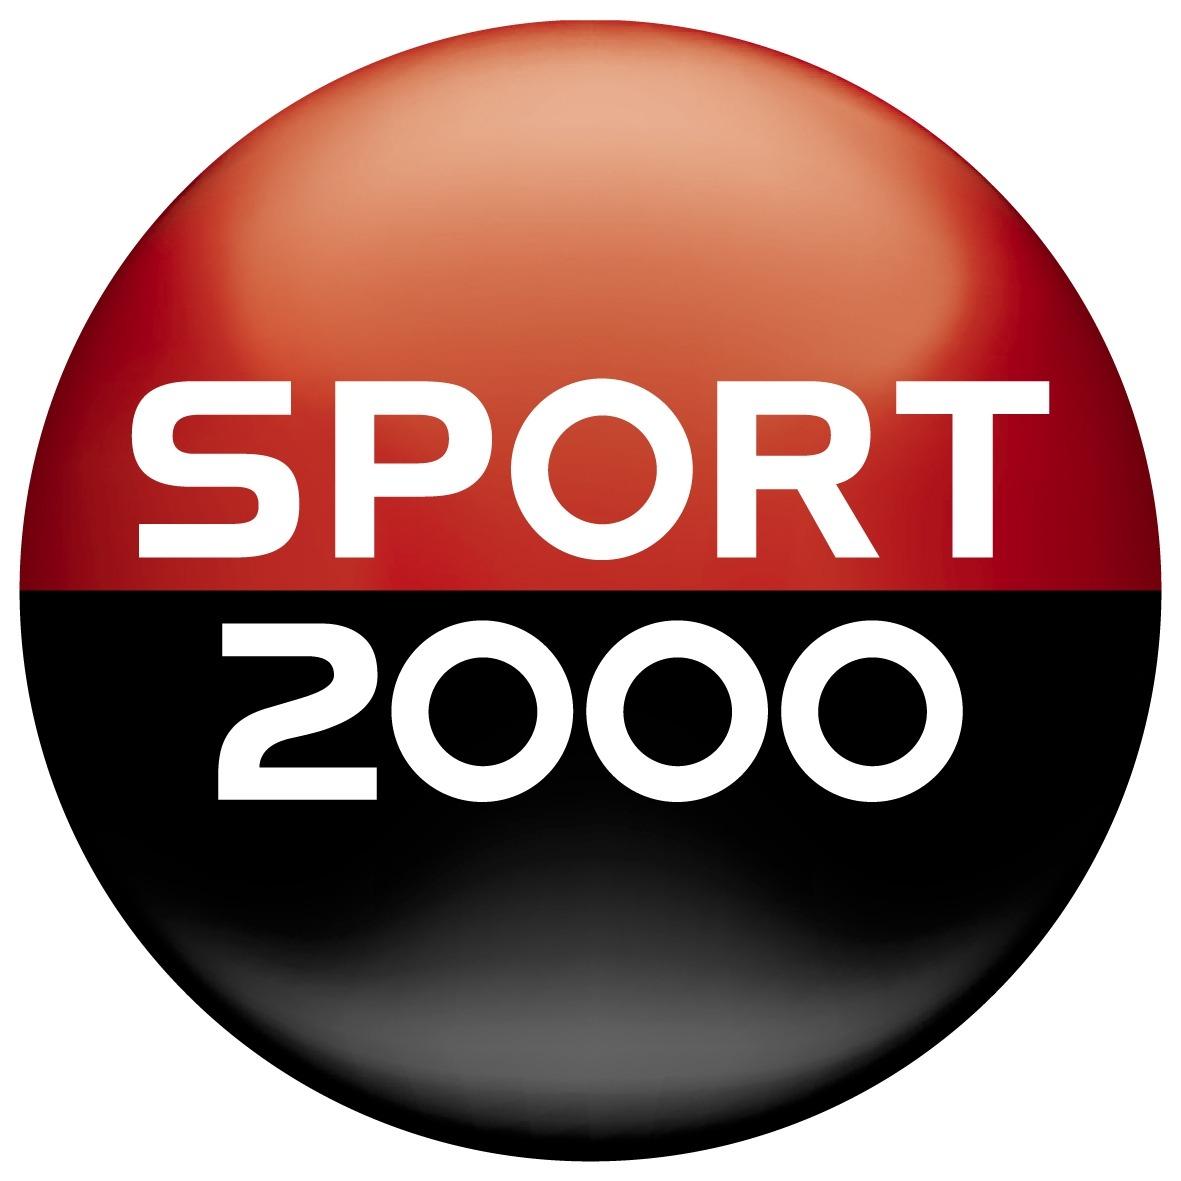 Comment contacter Sport 2000 ?